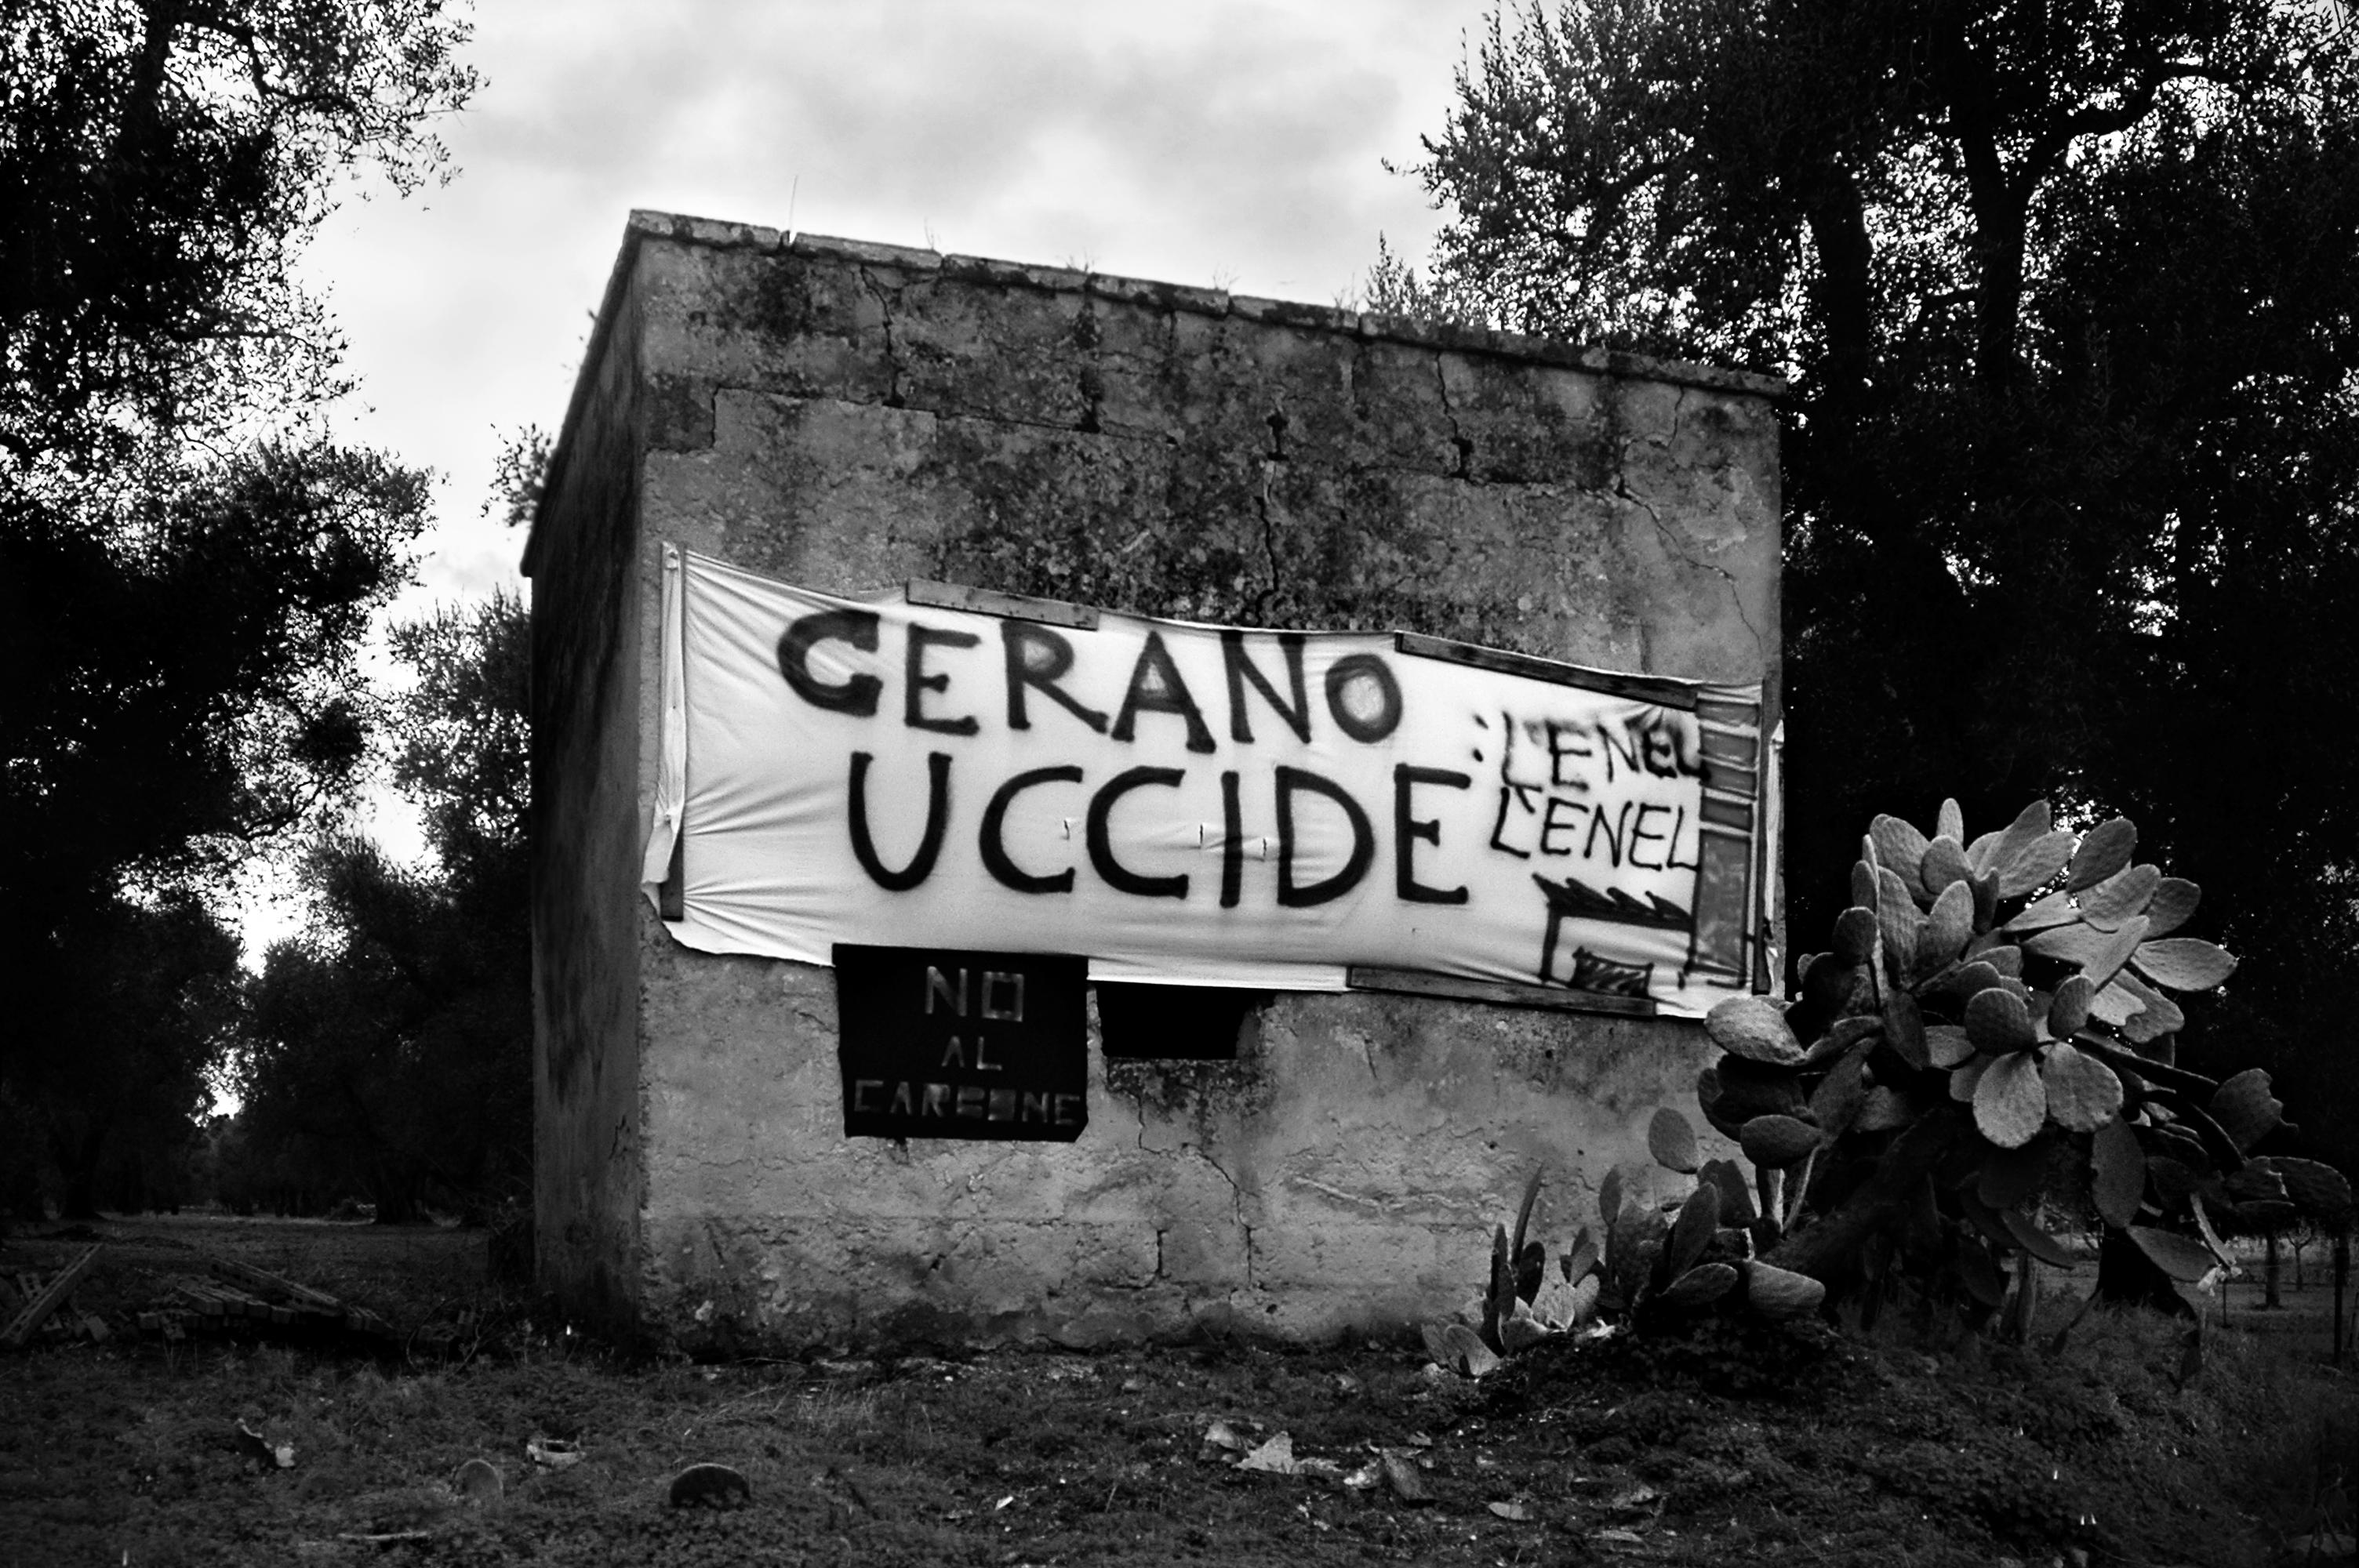 Sandro Mele, Raccontami di Cerano, 2010